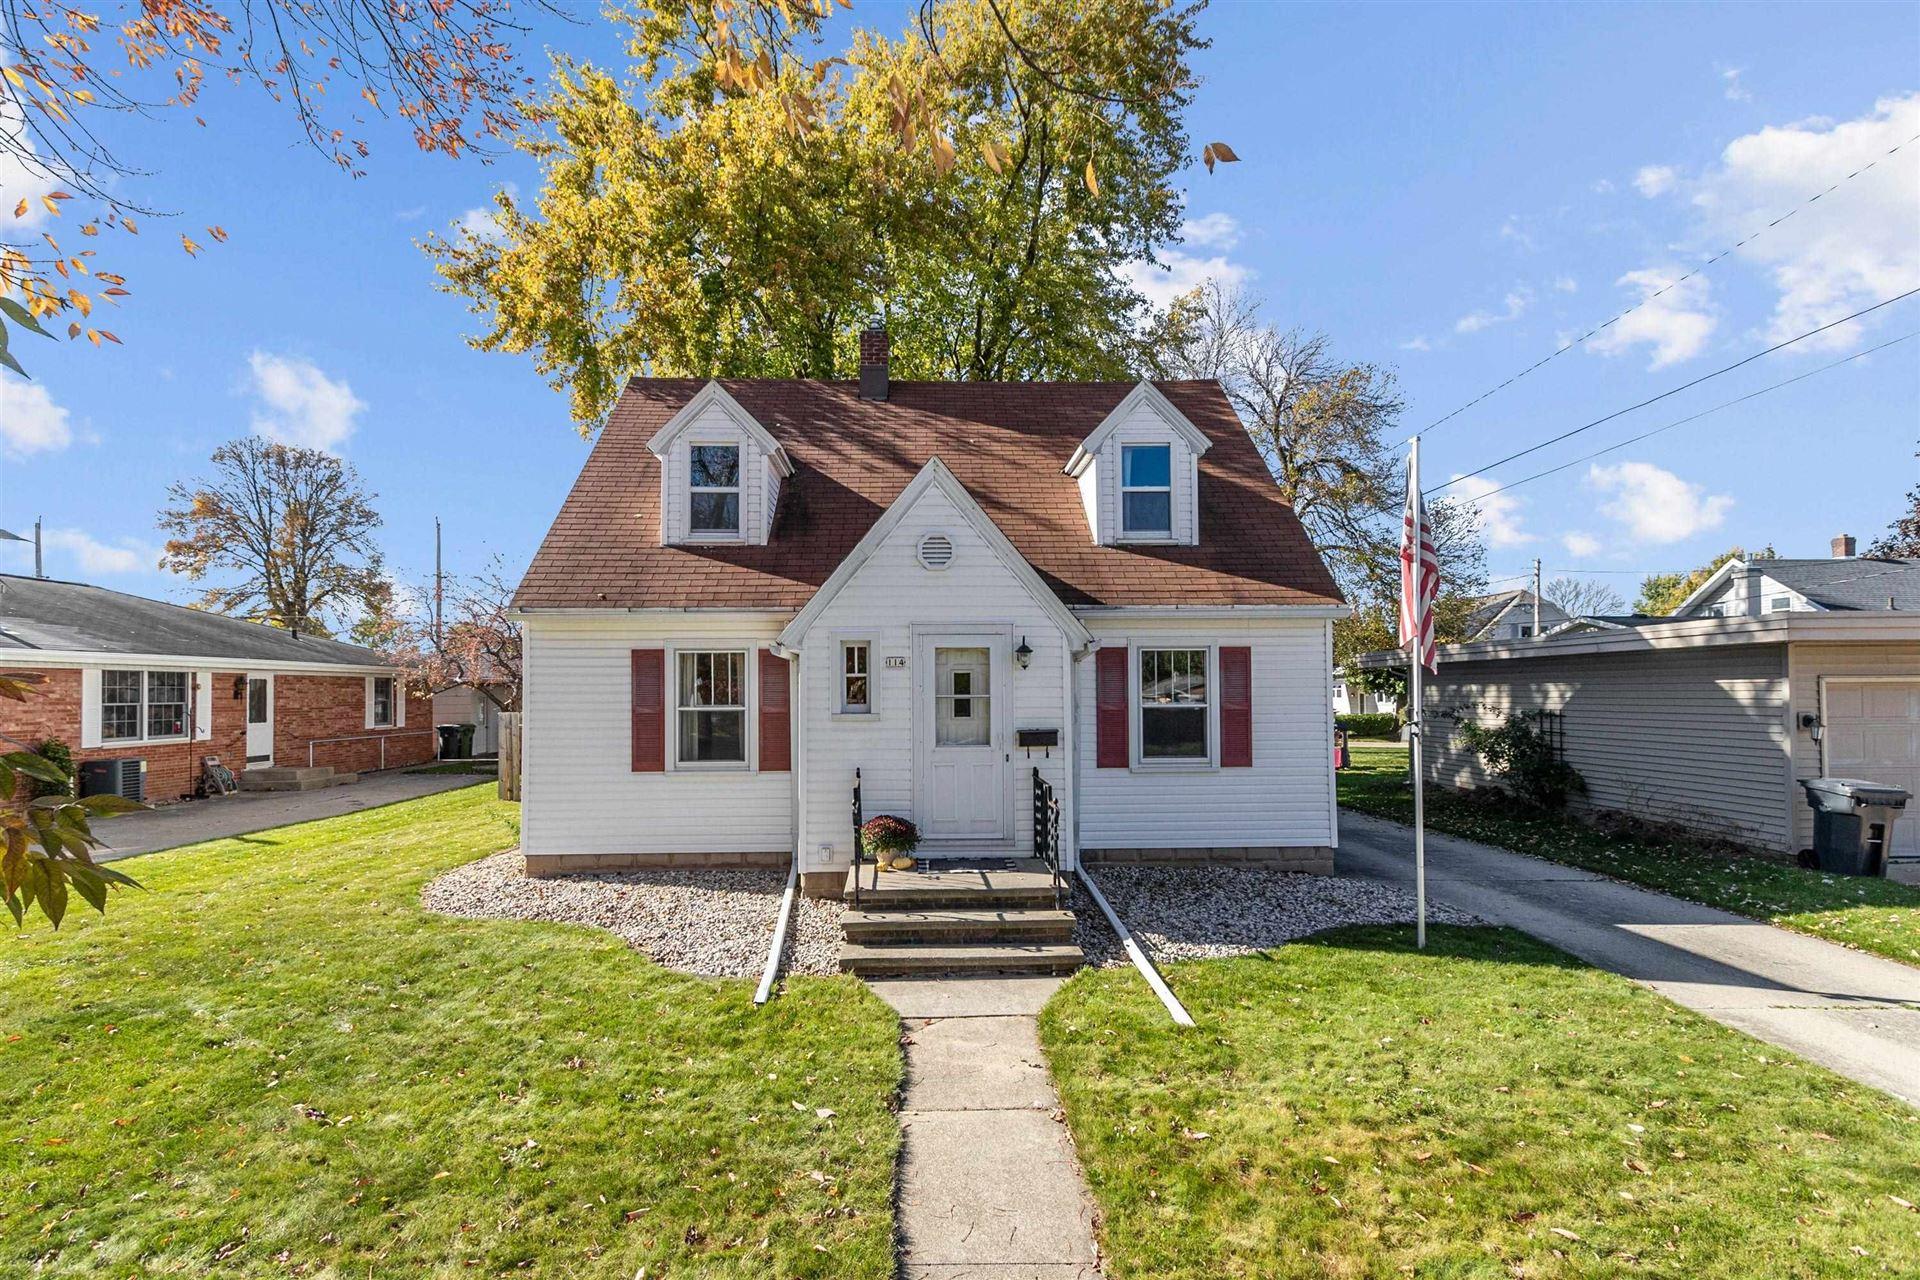 114 S PINE Street, Kimberly, WI 54136 - MLS#: 50249946